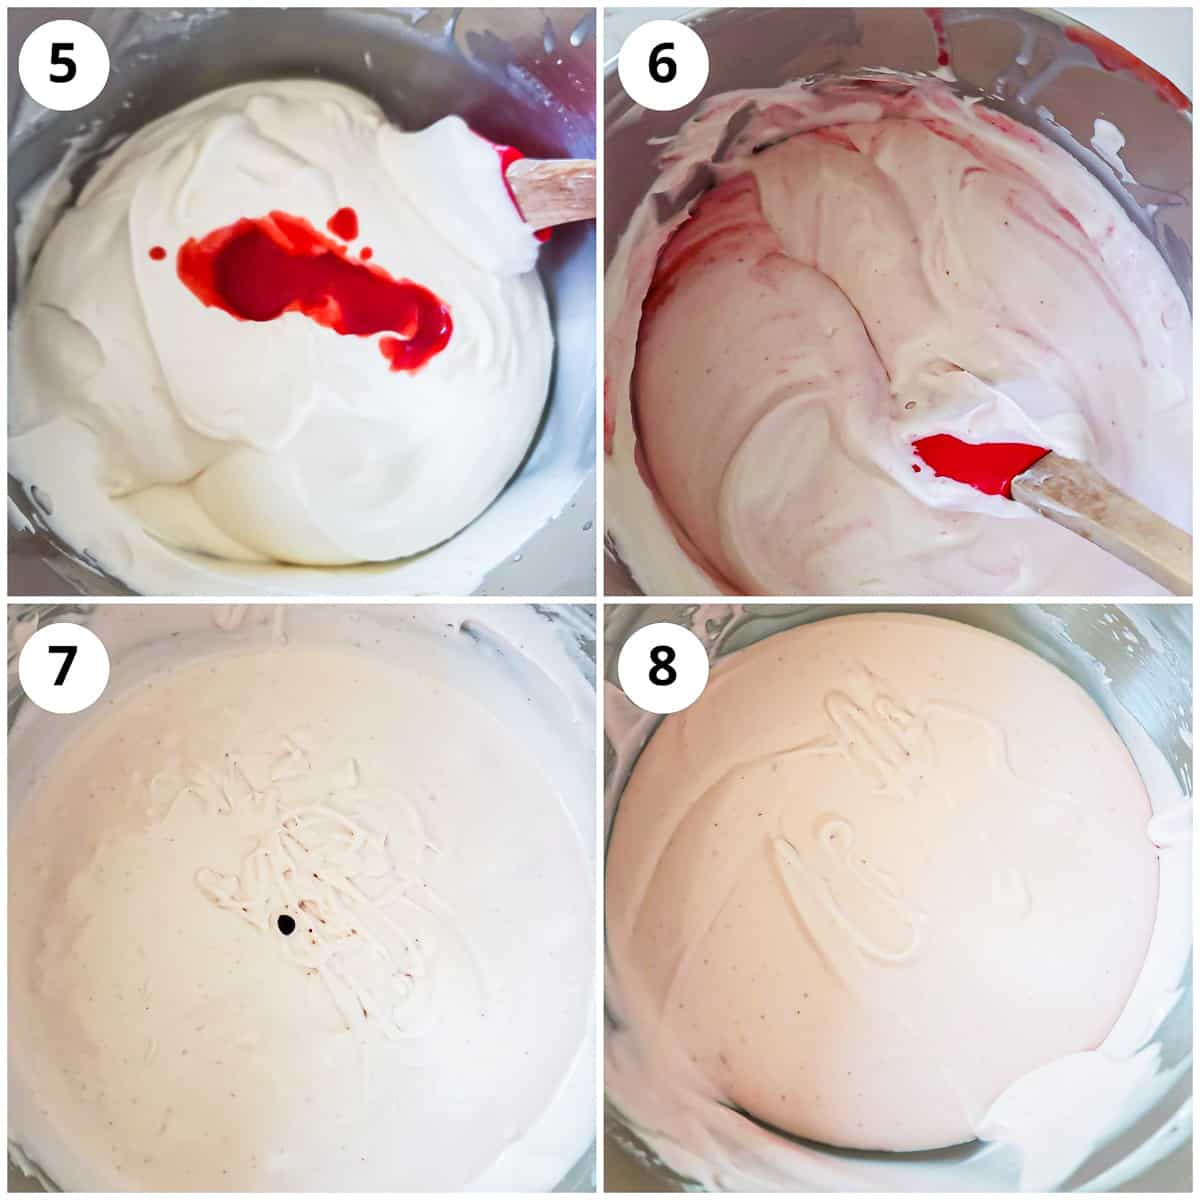 Adding the strawberry puree to vanilla icecream base to make strawberry icecream